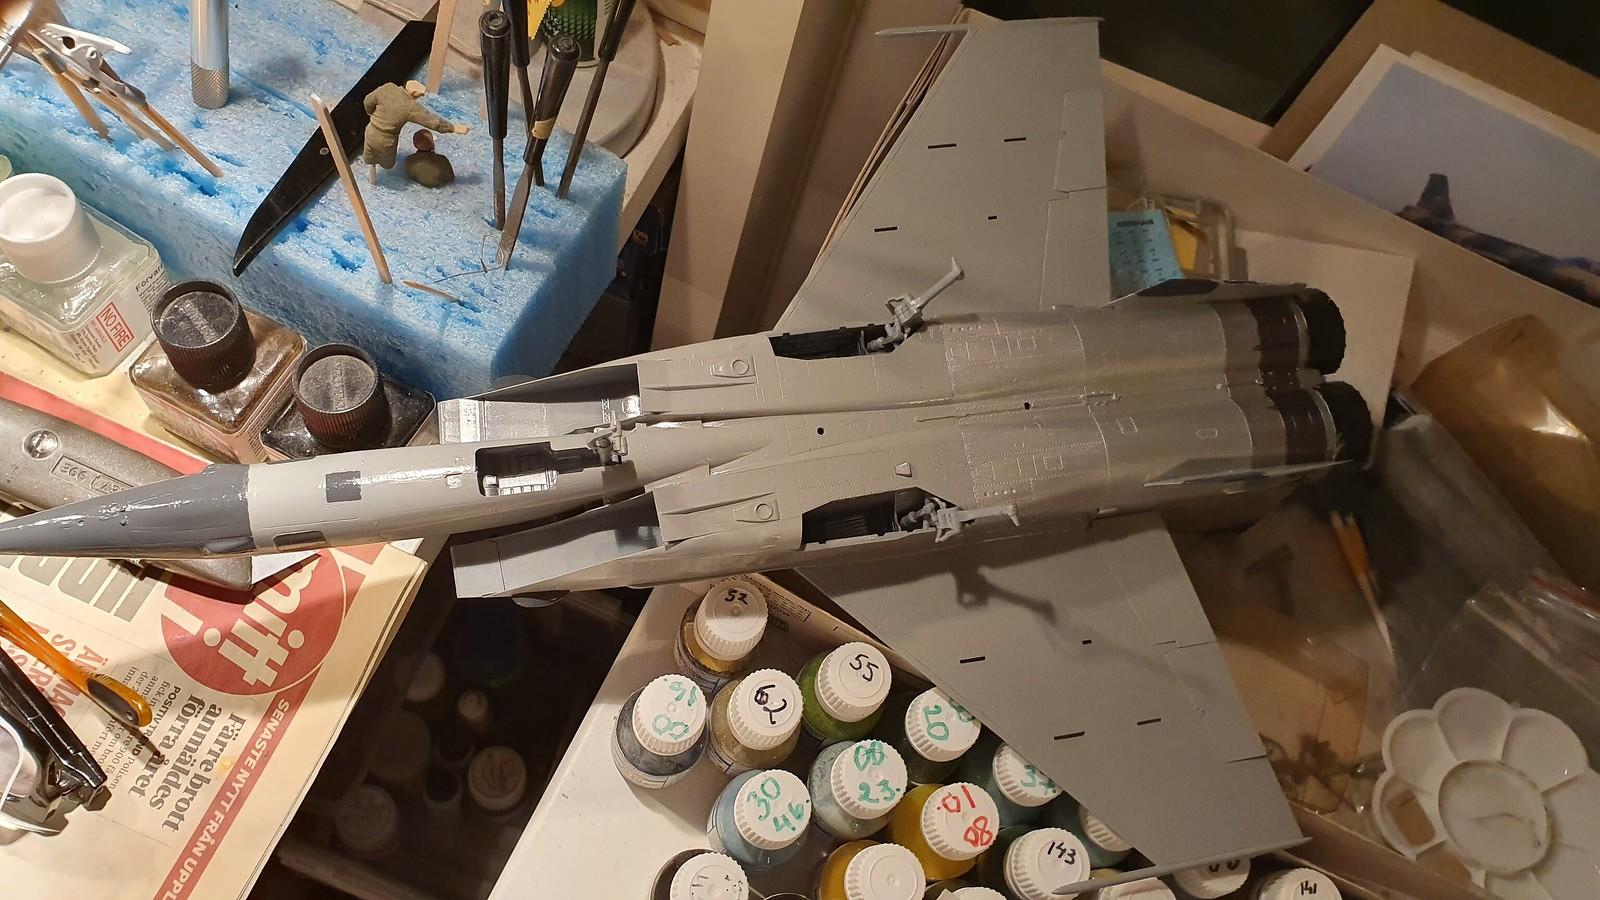 MiG-25BM Iraqi Air Force 1988 - ICM/Revell 1/48 + extra - Färdig! - Sida 7 48915069192_449ed373c0_h